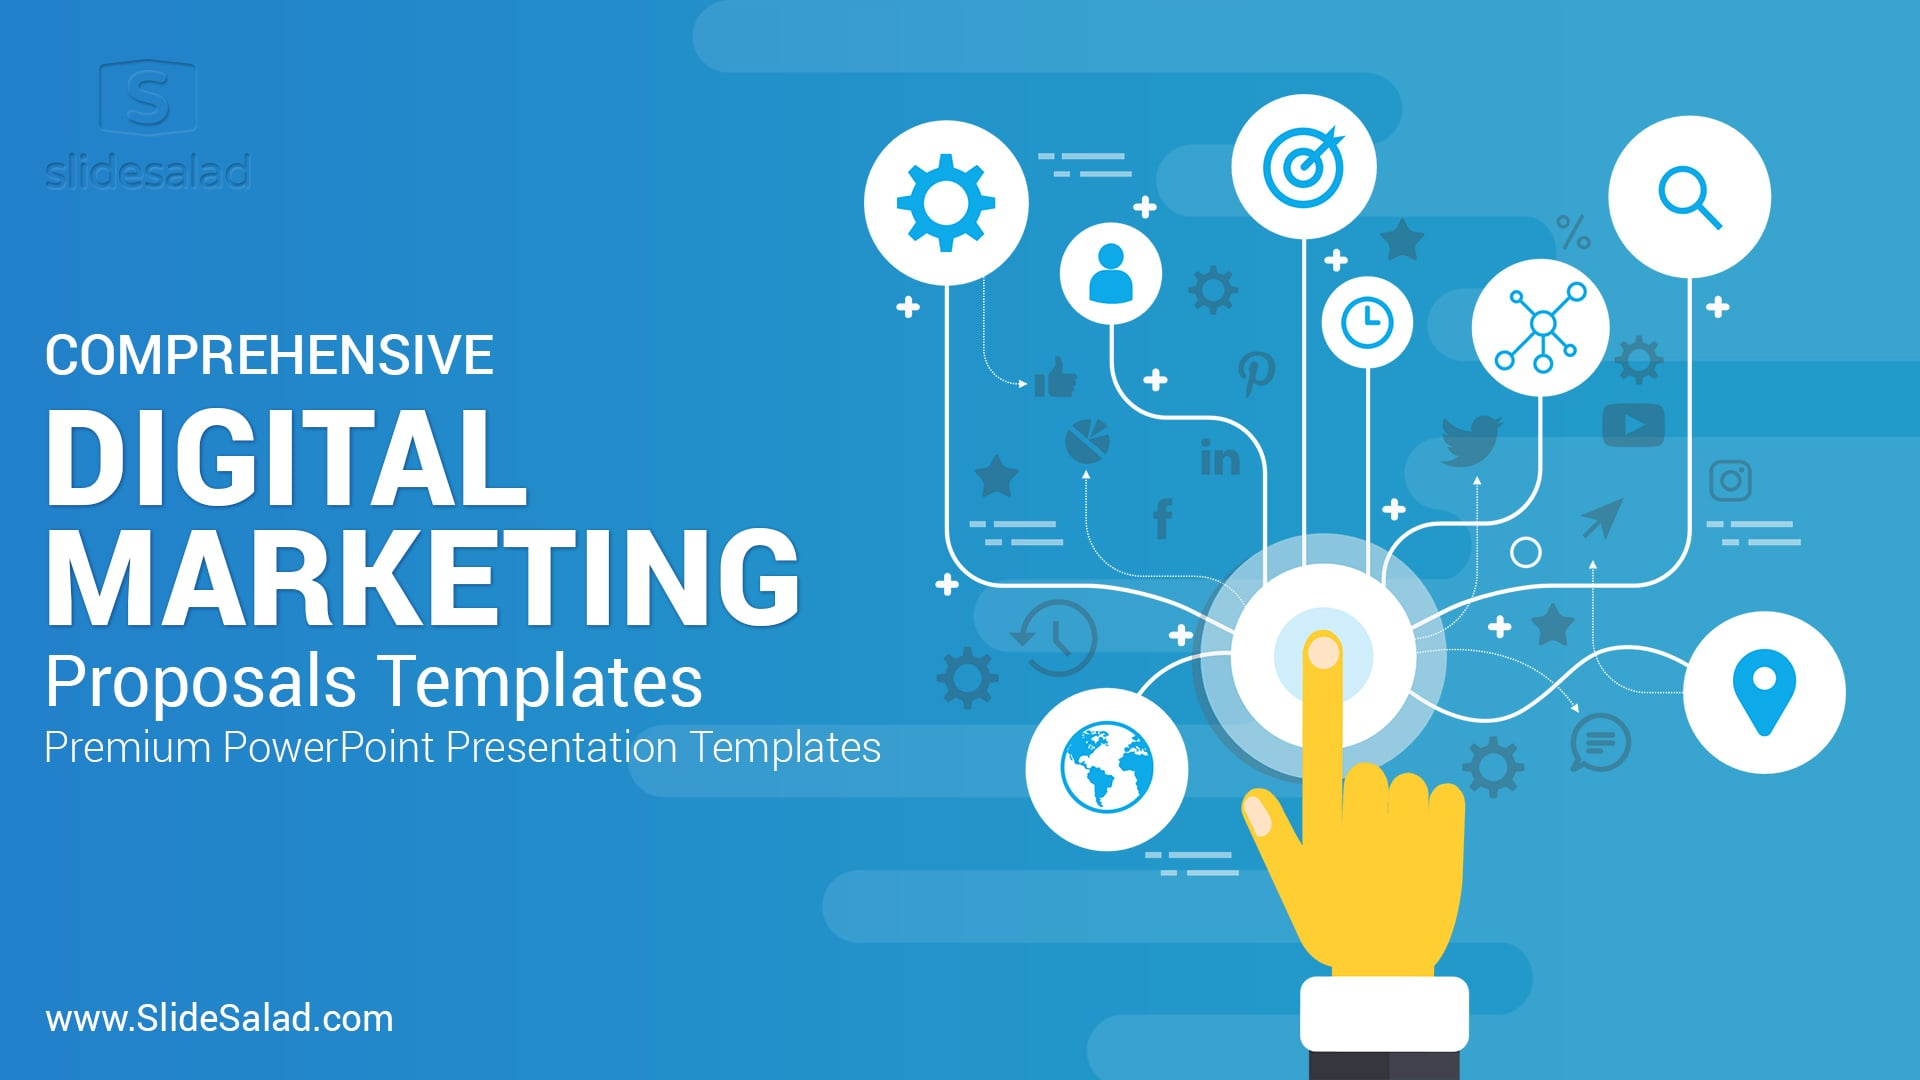 Best Digital Marketing Proposals PowerPoint Templates – Elegant PPT Templates for Business Presentations